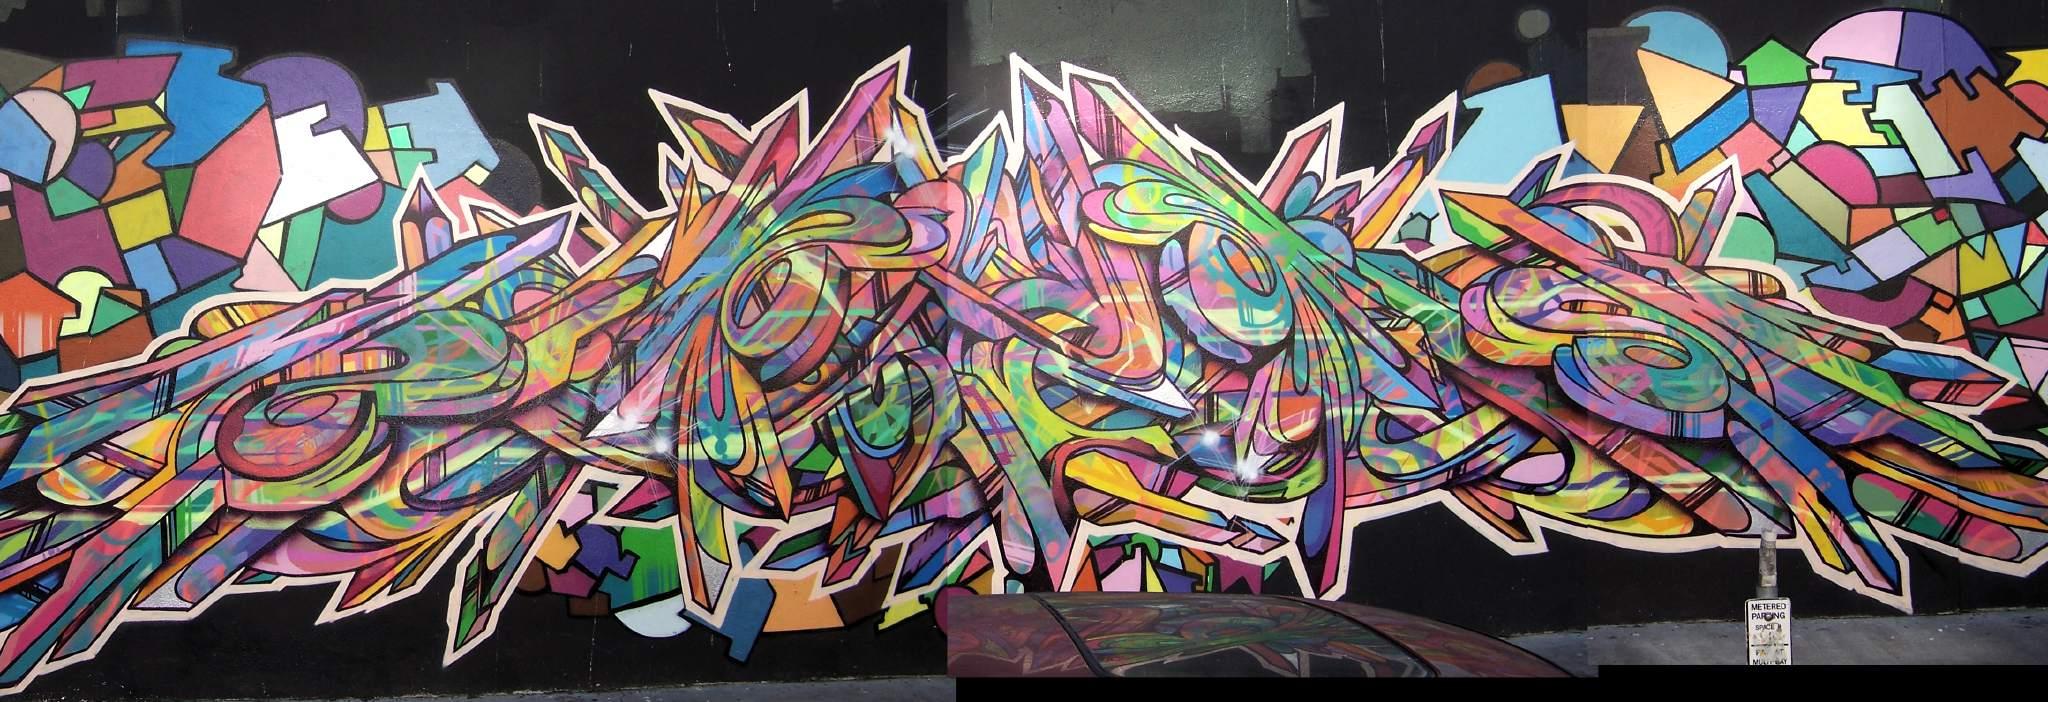 Art Crimes San Francisco Bay Area 101